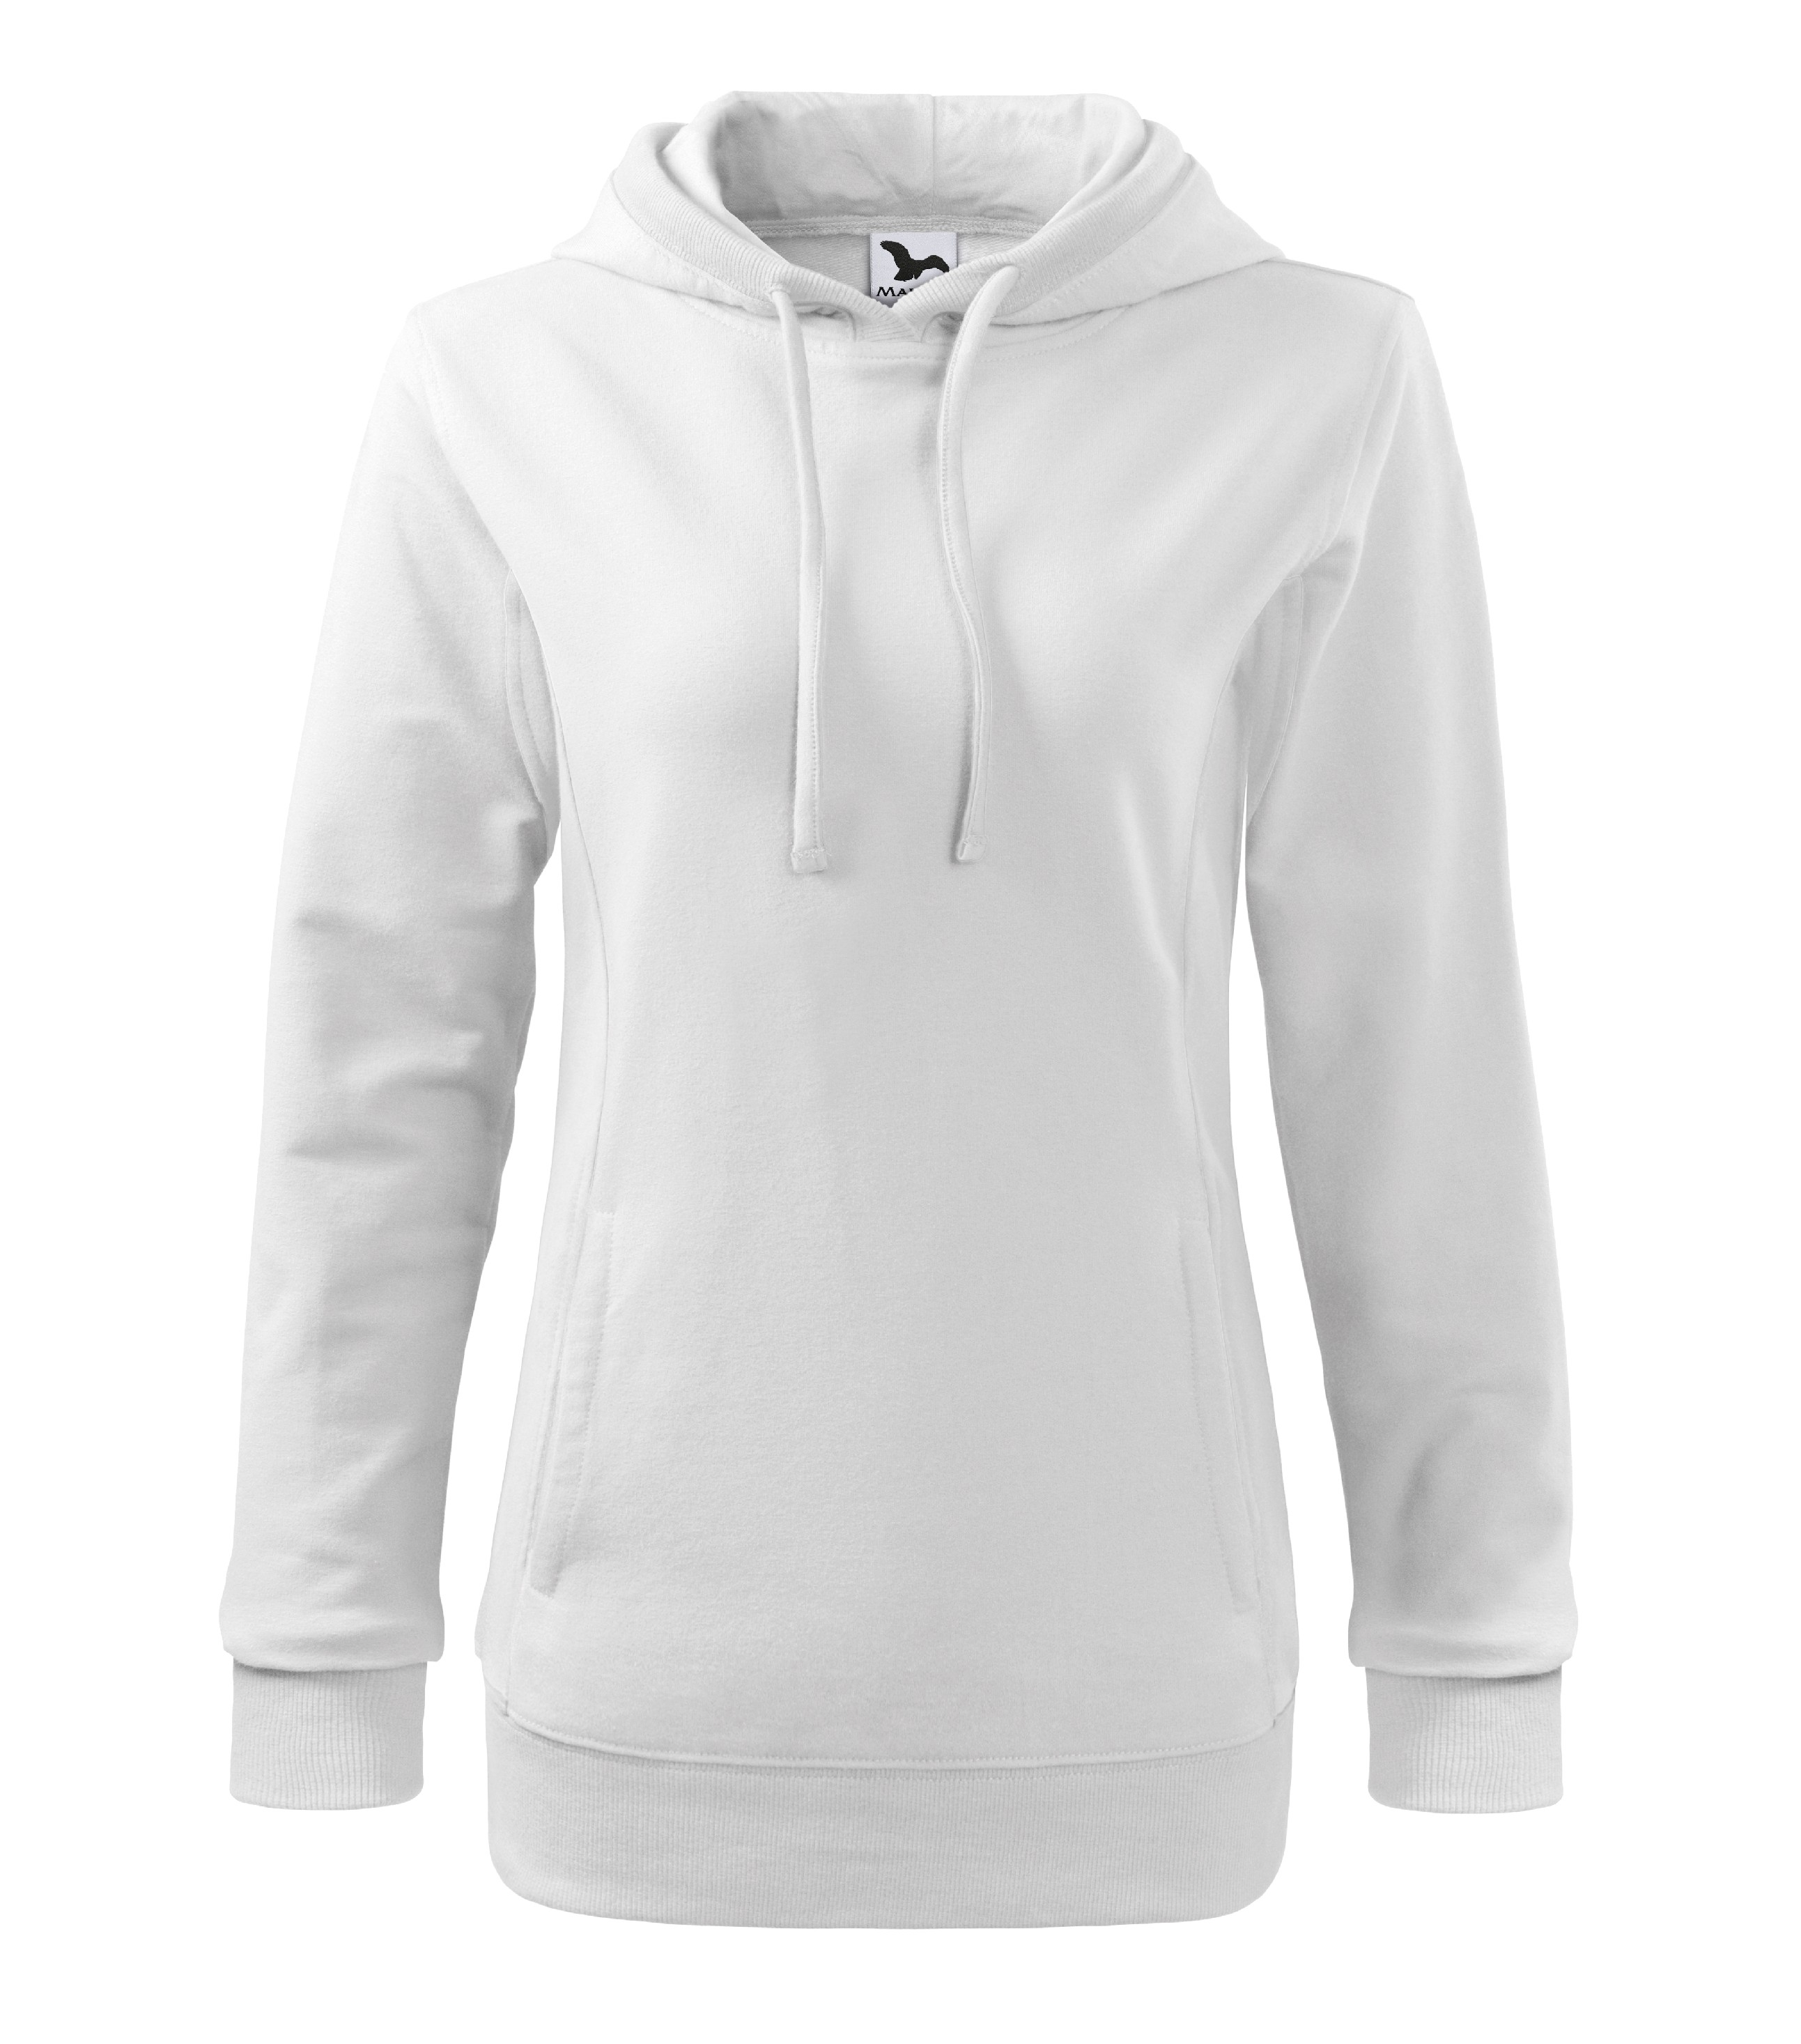 Mikina dámská Kangaroo Barva  bílá bílá 9a54d533ca